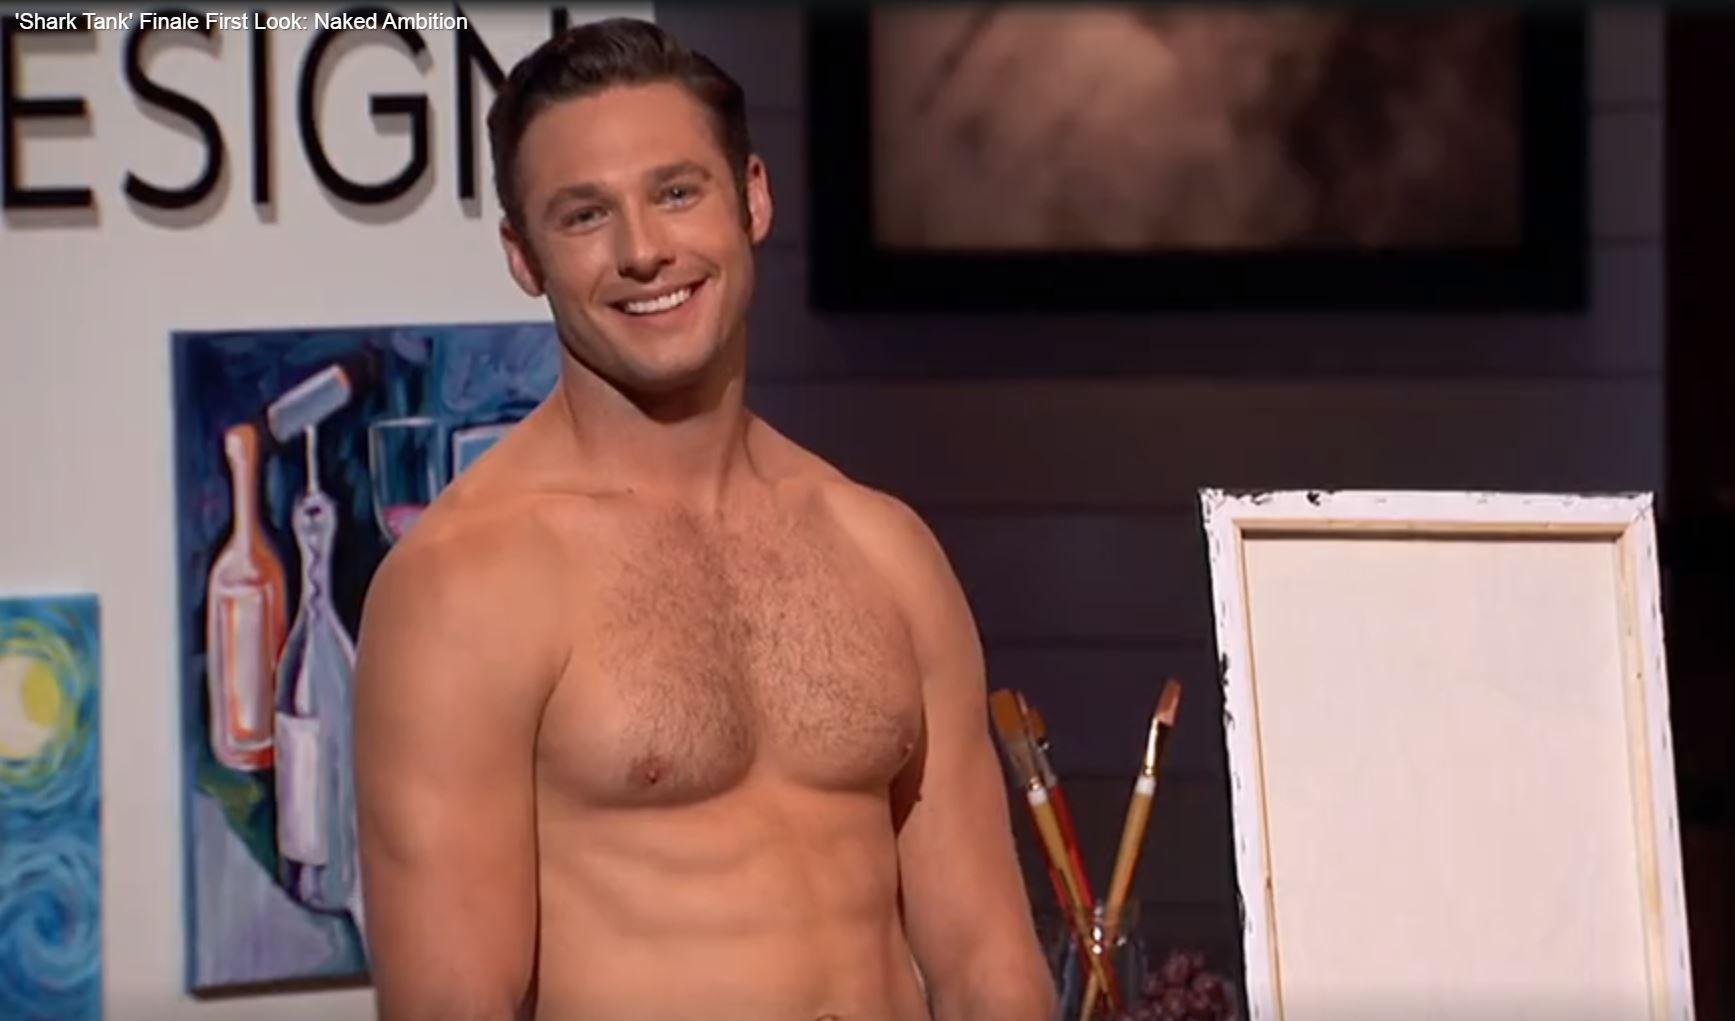 Investors on ABCs Shark Tank shocked as man strips